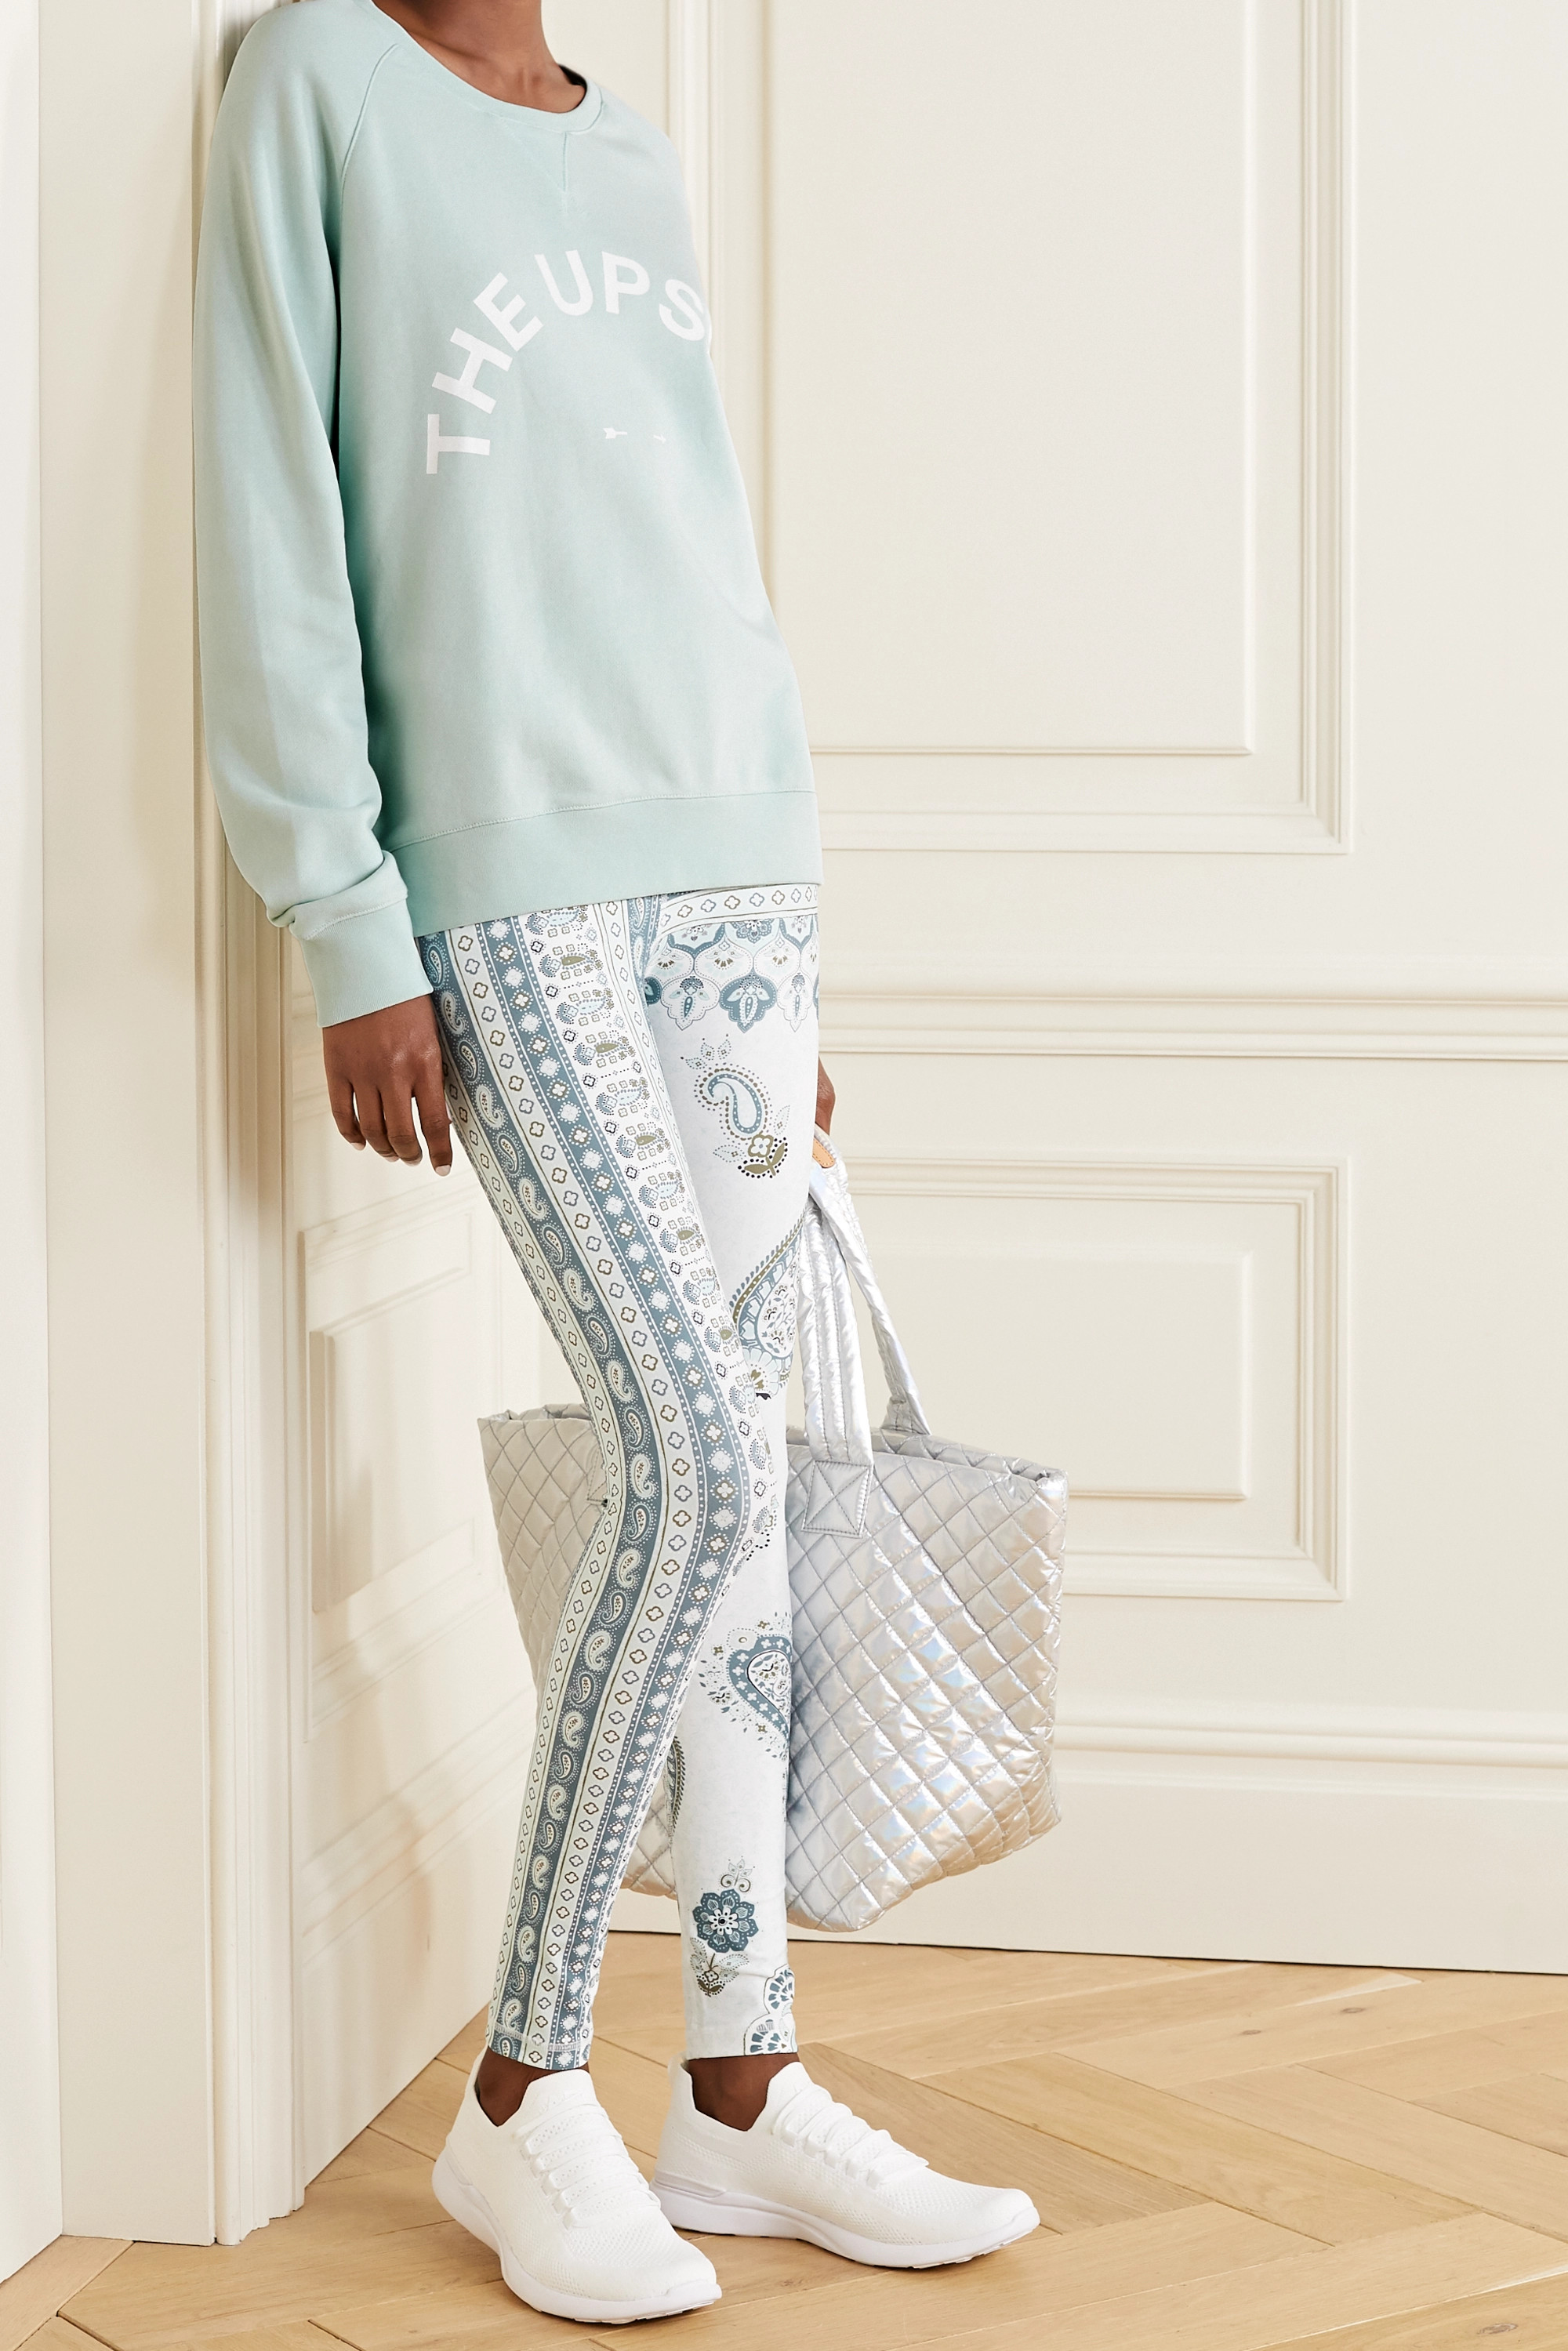 The Upside Bondi bedrucktes Sweatshirt aus Baumwoll-Jersey